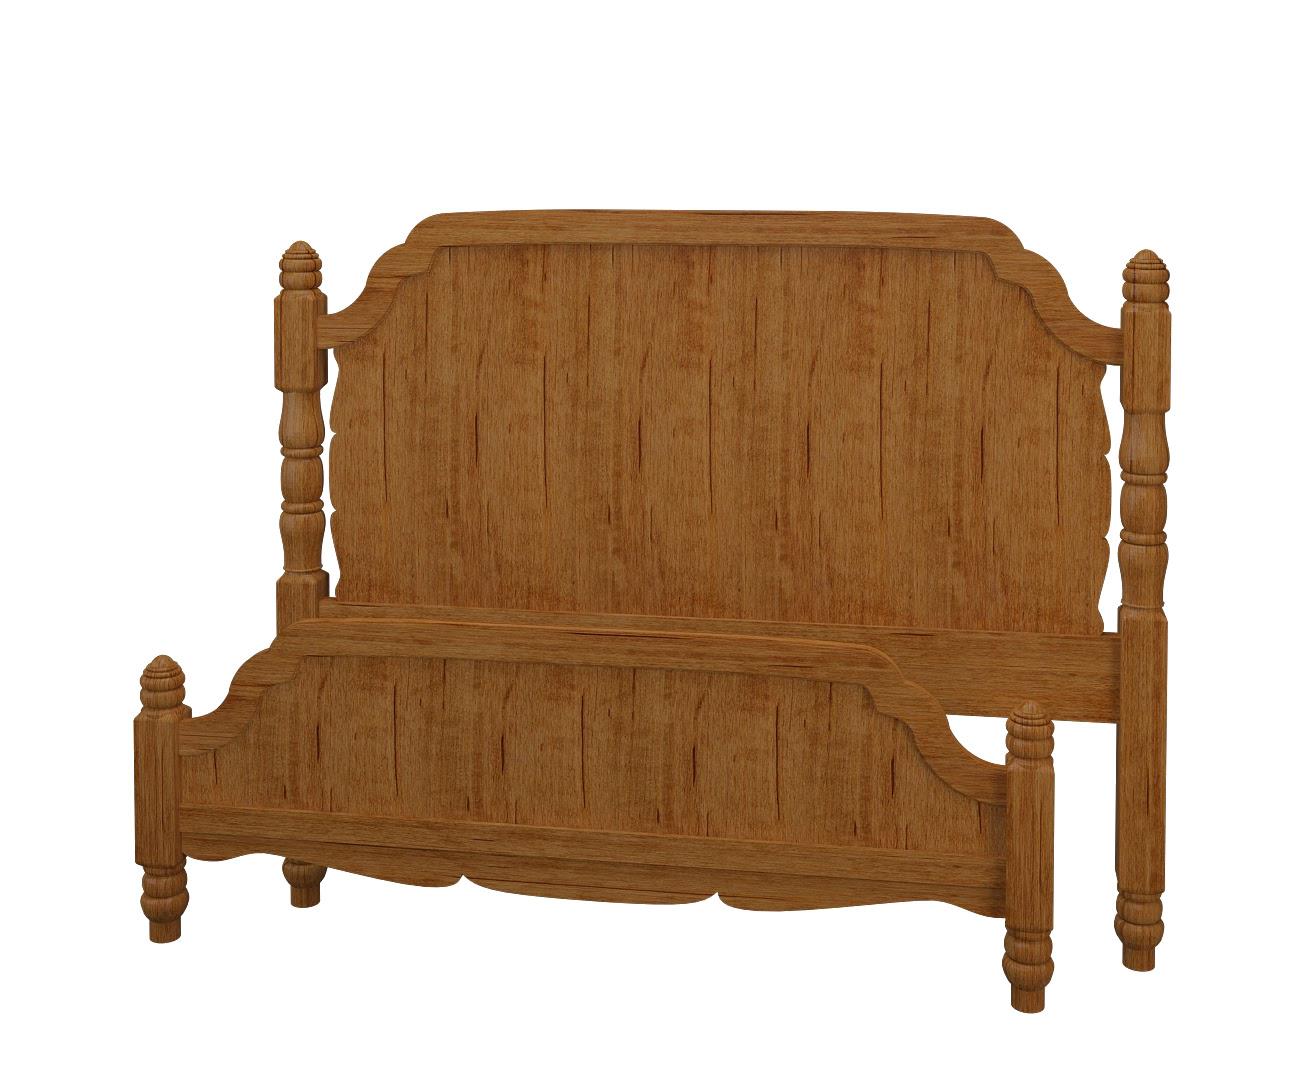 Farmhouse Platform Bed In Como Maple